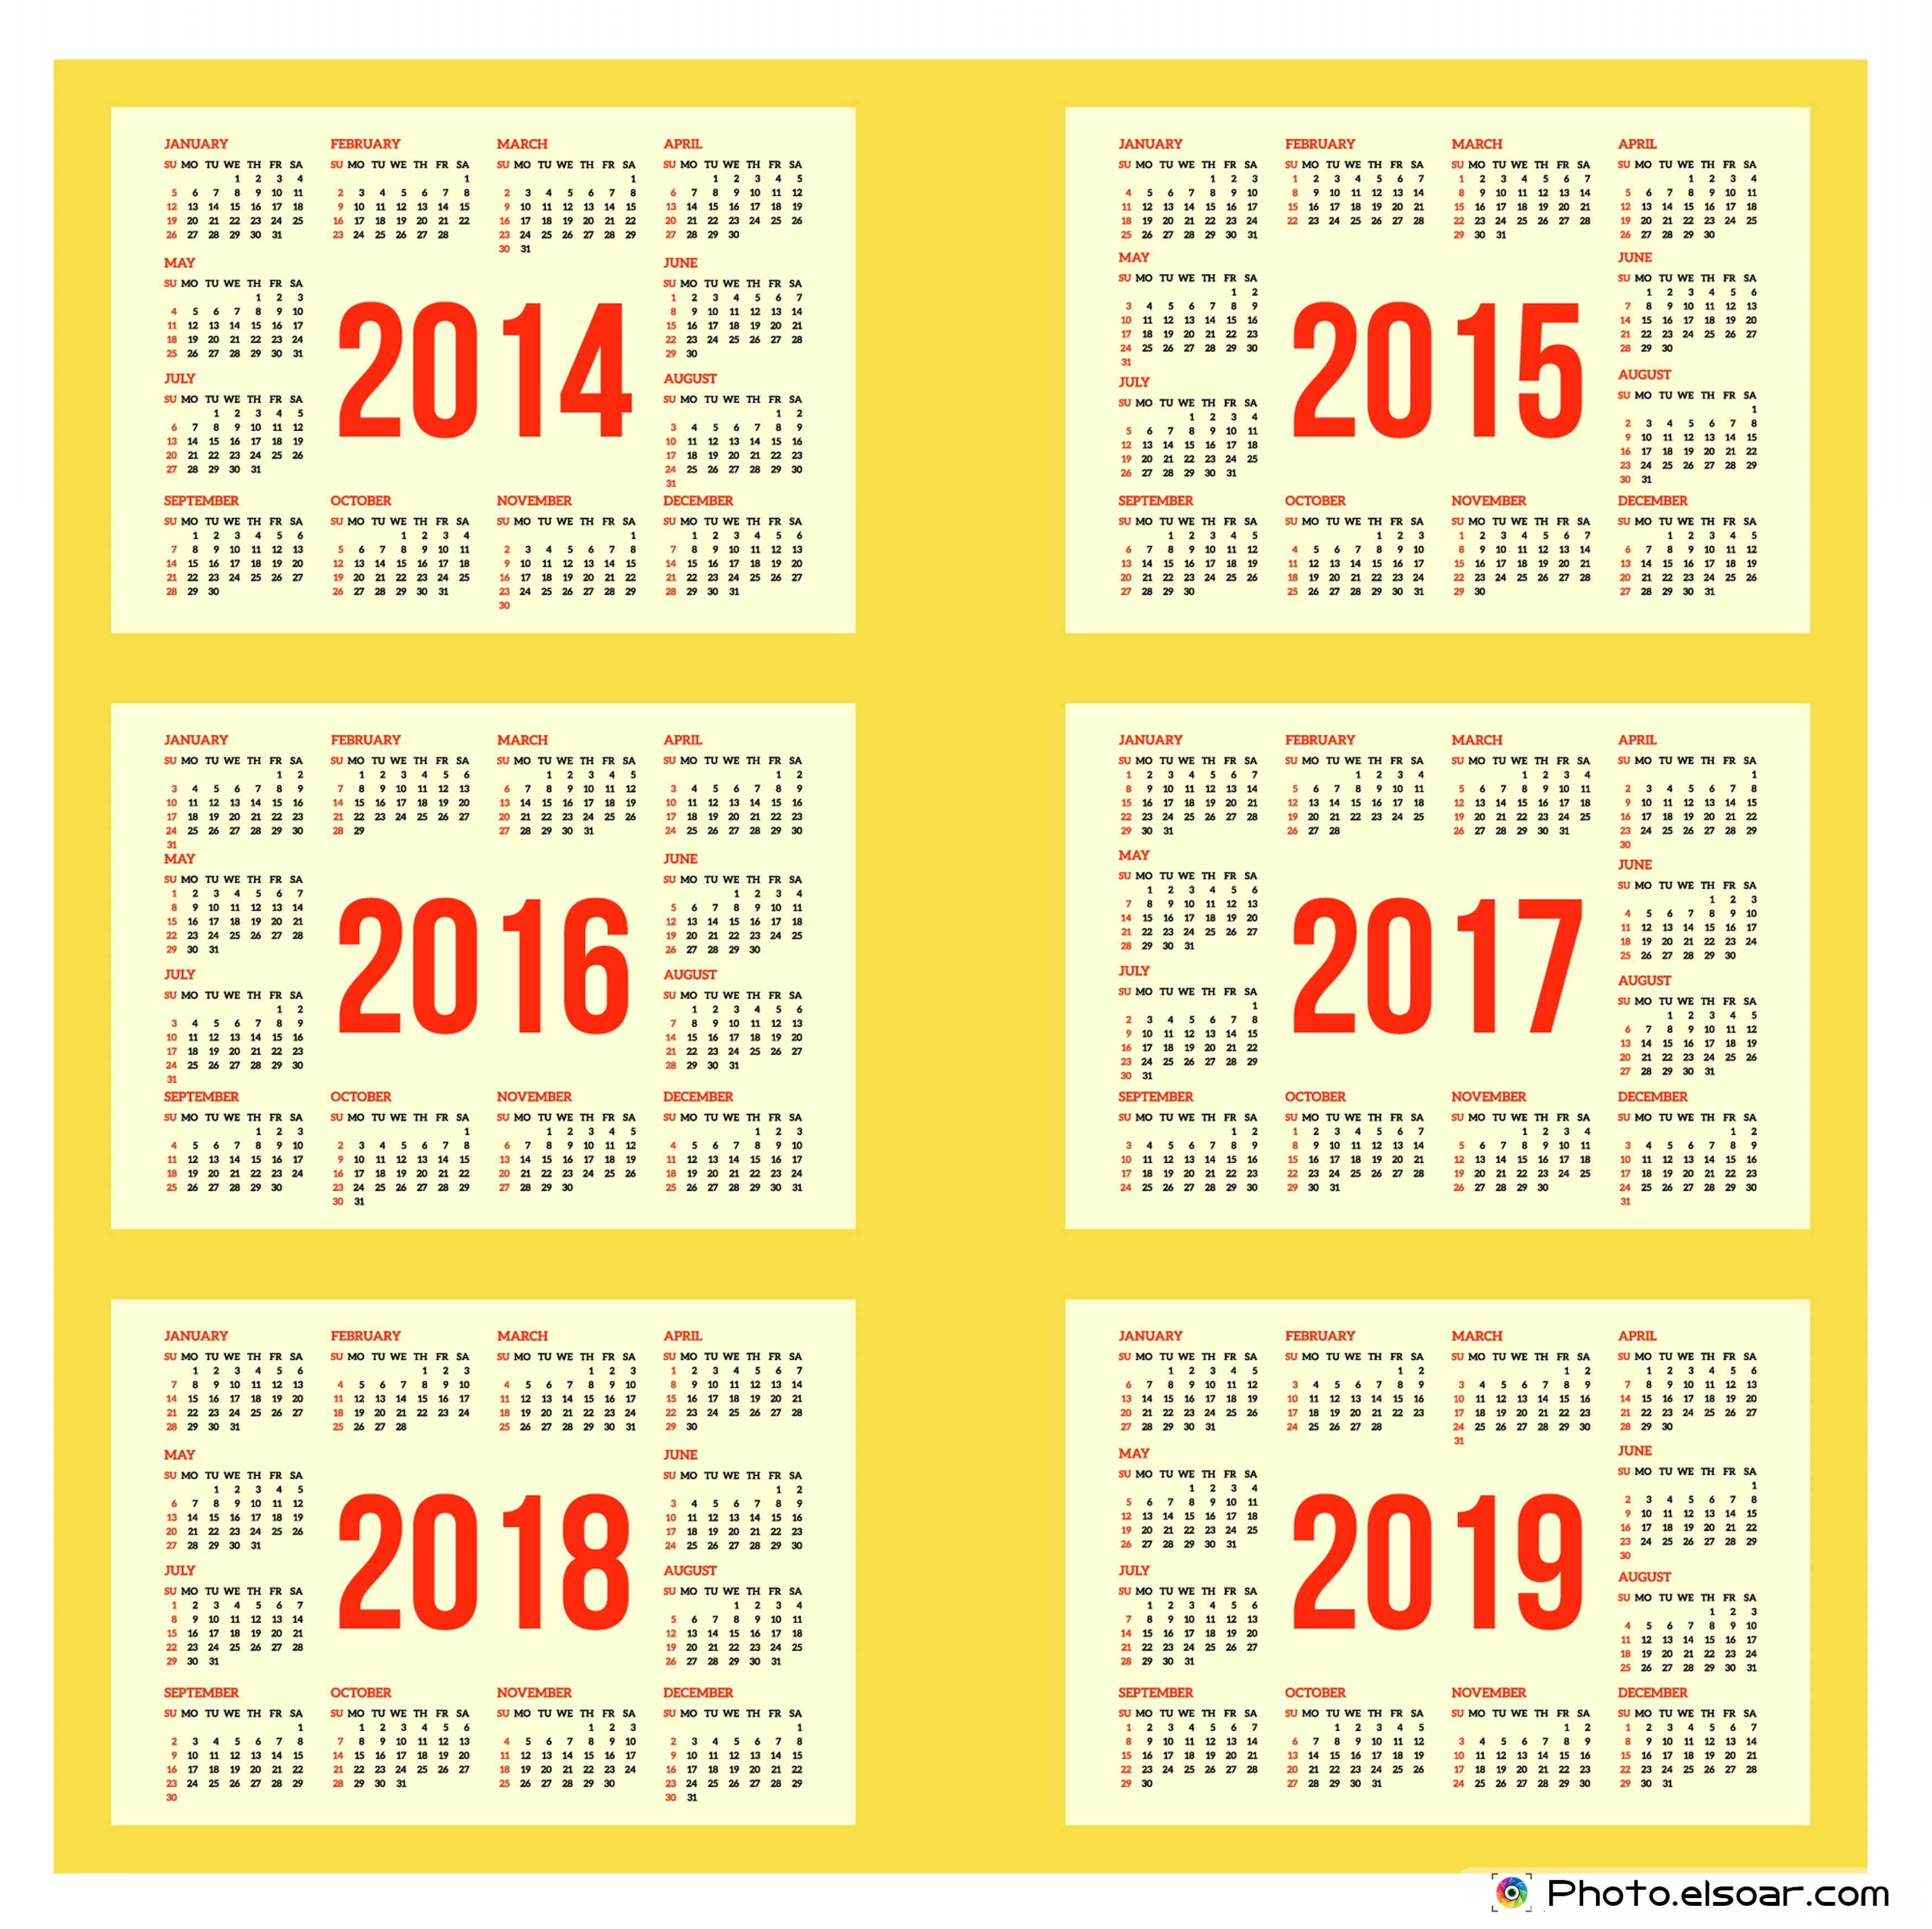 2016 2017 Related Keywords & Suggestions - Islamic Calendar 2016 ...